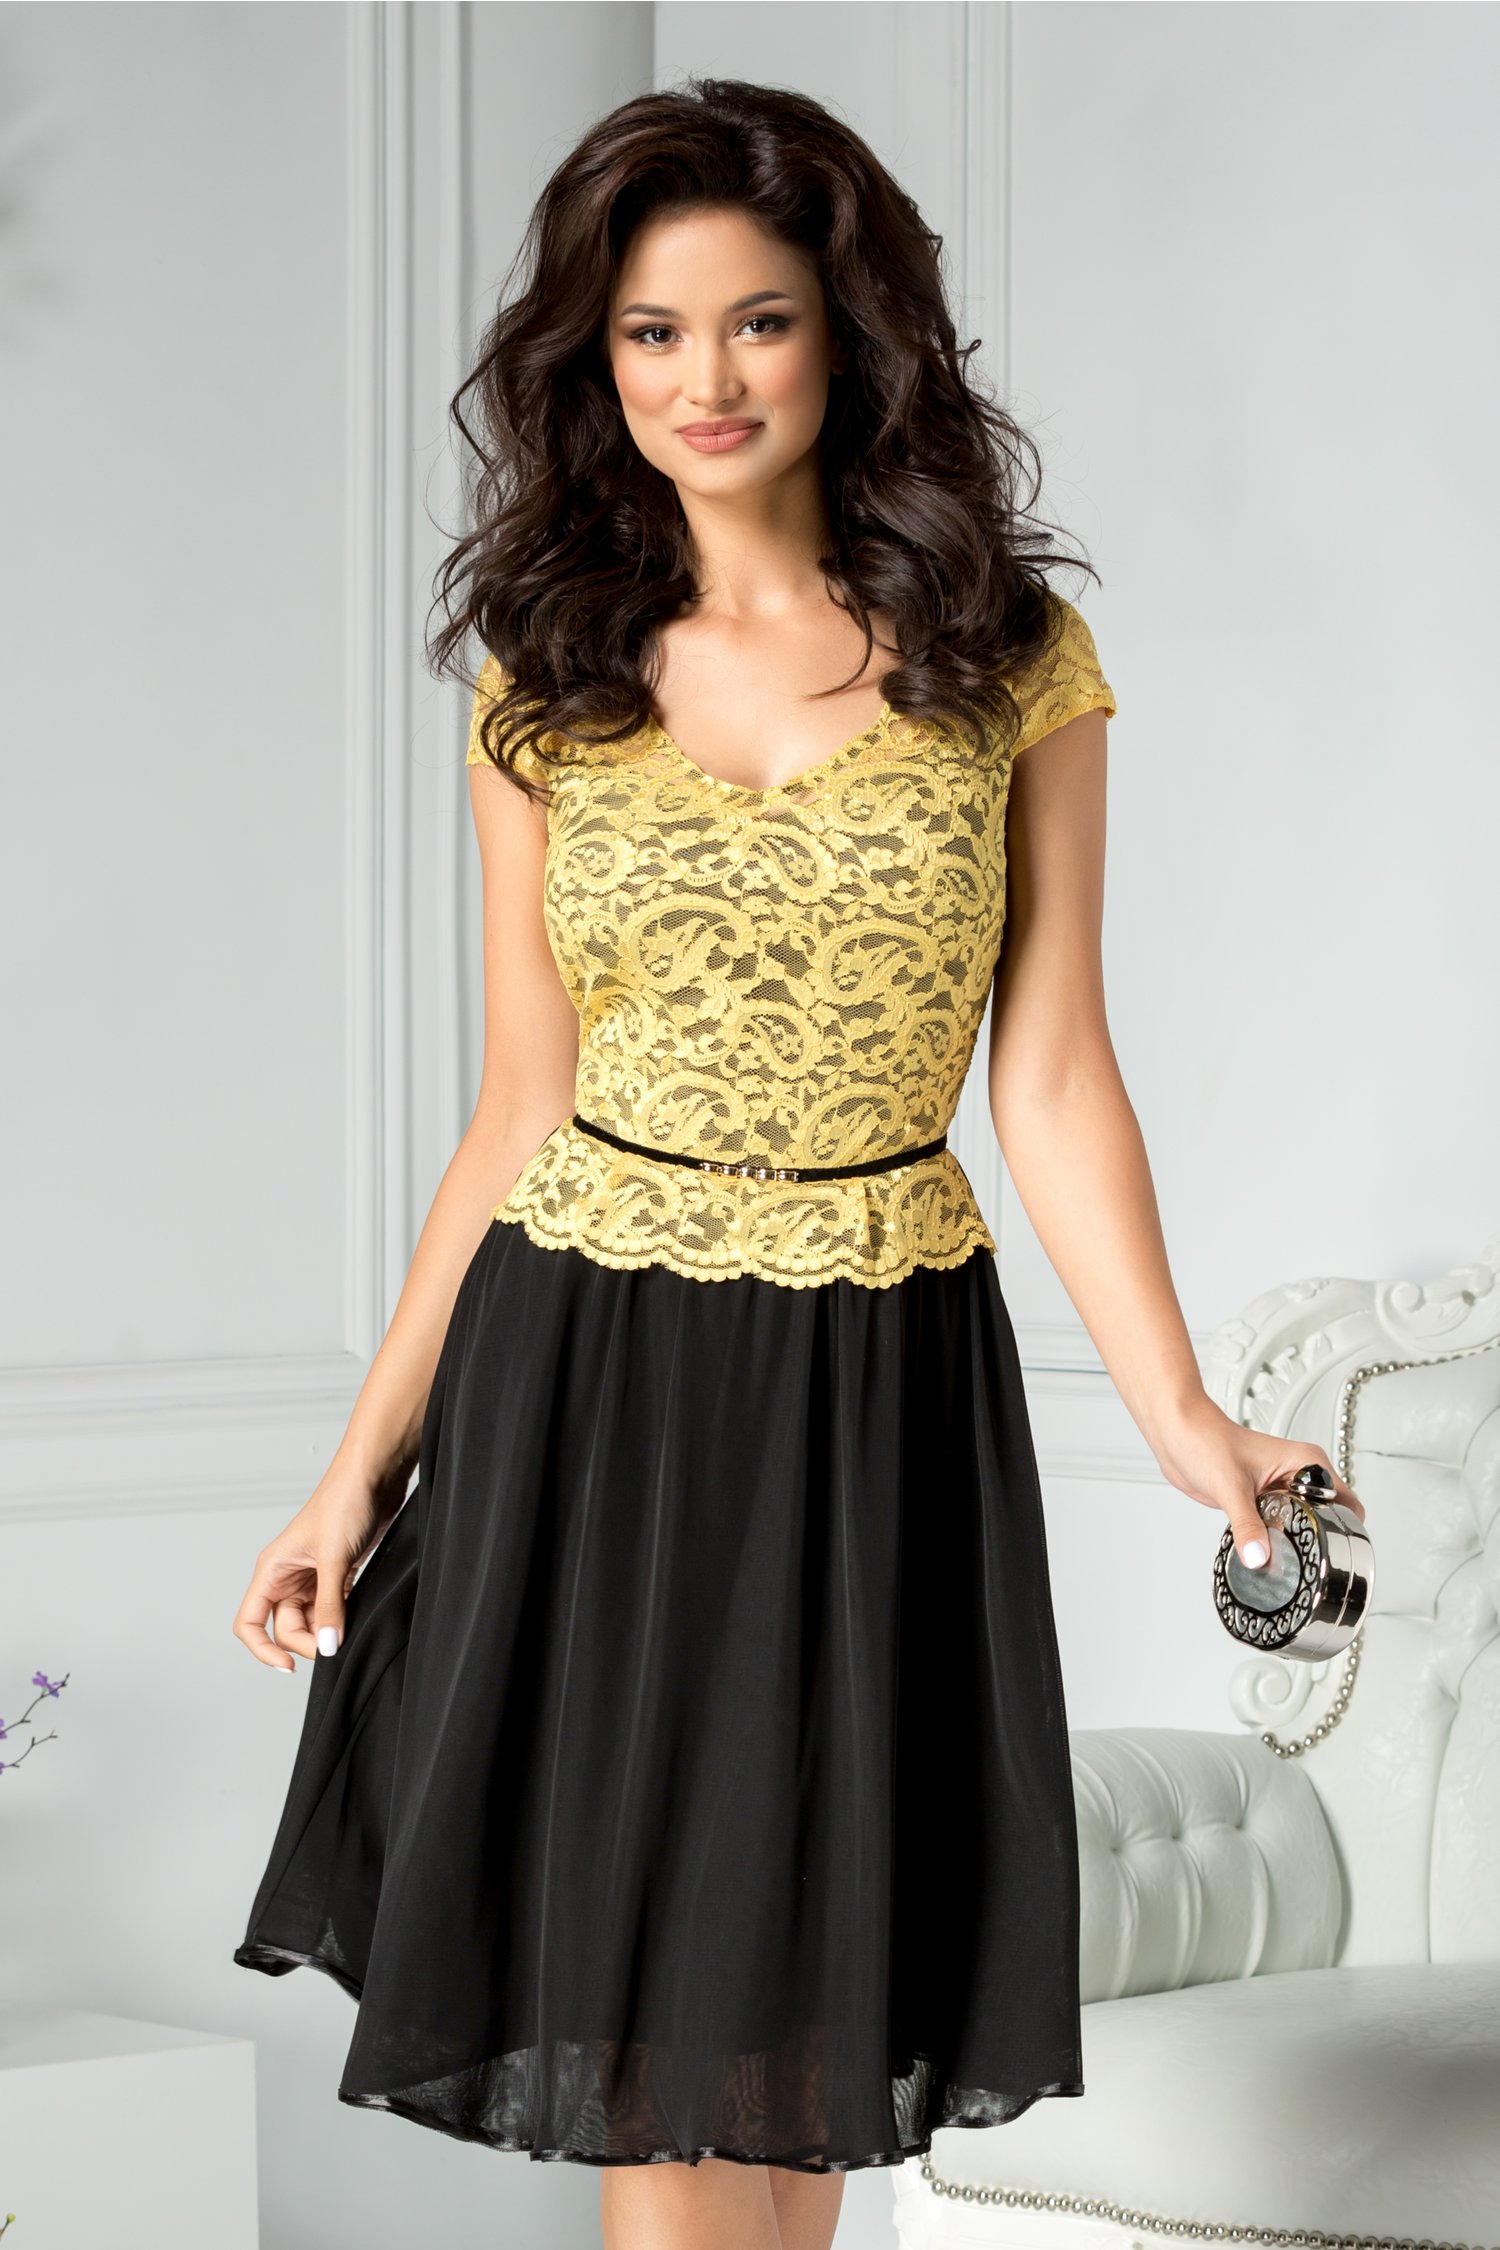 Rochie Tanya de ocazie galben si negru cu dantela la bust